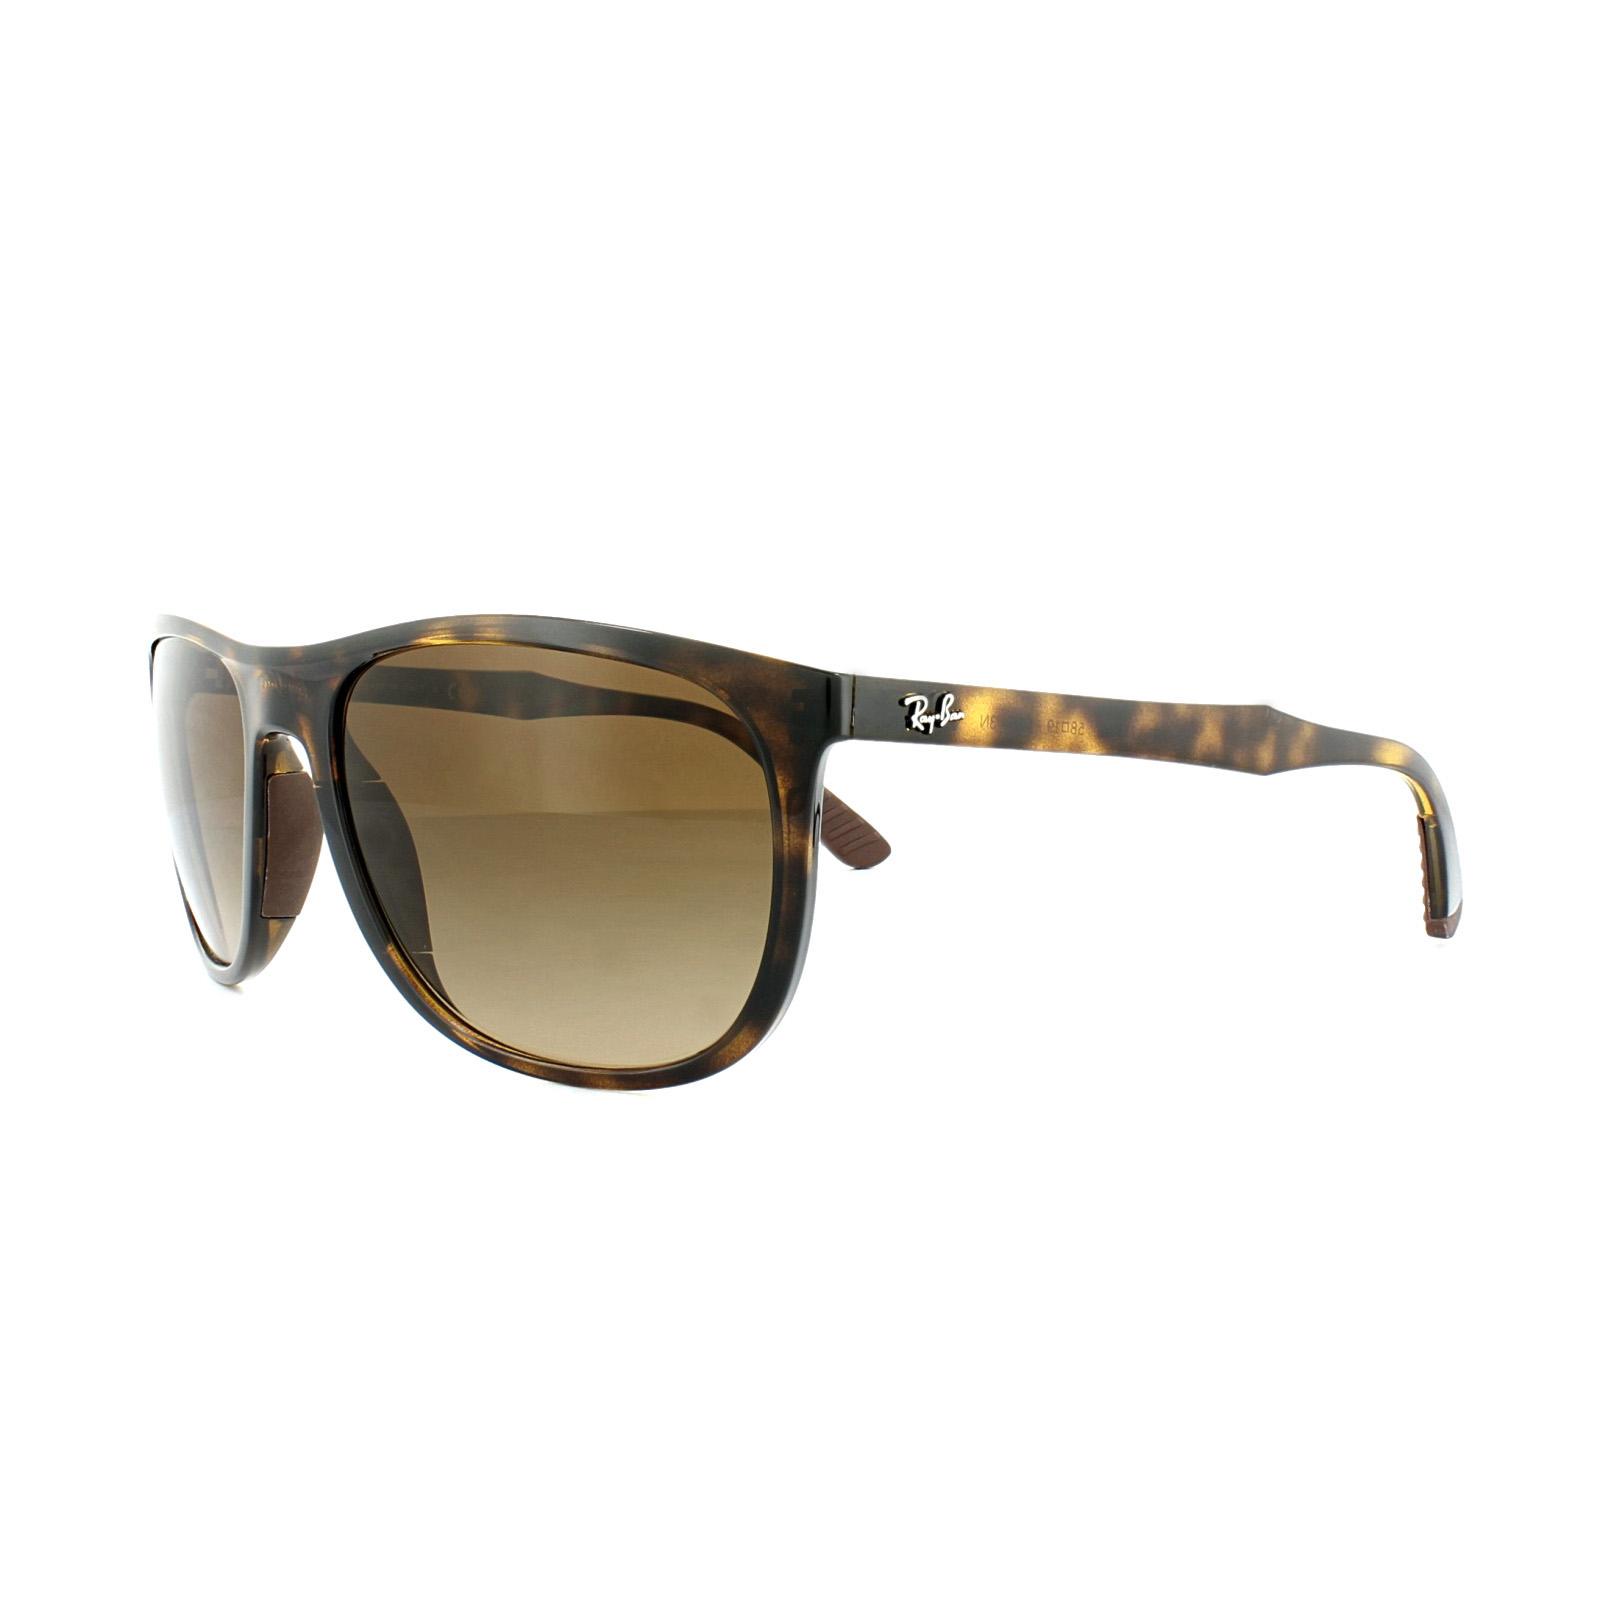 97032914c0 Cheap Ray-Ban 4291 Sunglasses - Discounted Sunglasses